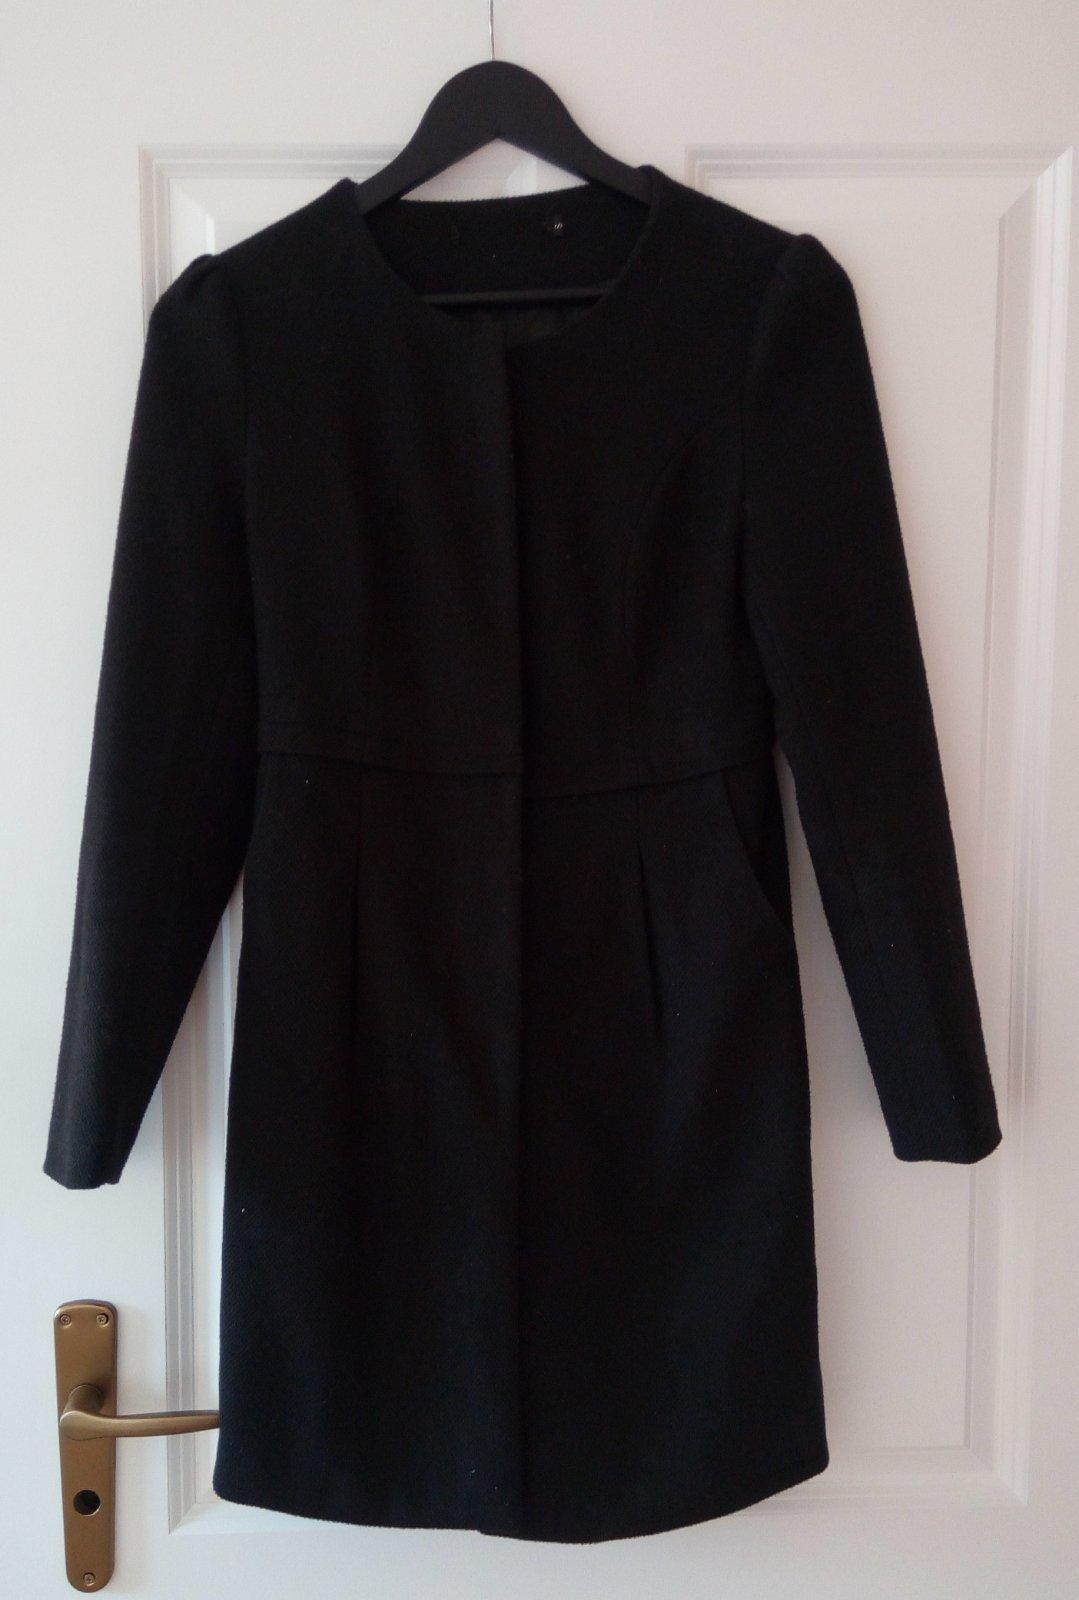 Čierny kabát/sako S - Obrázok č. 4